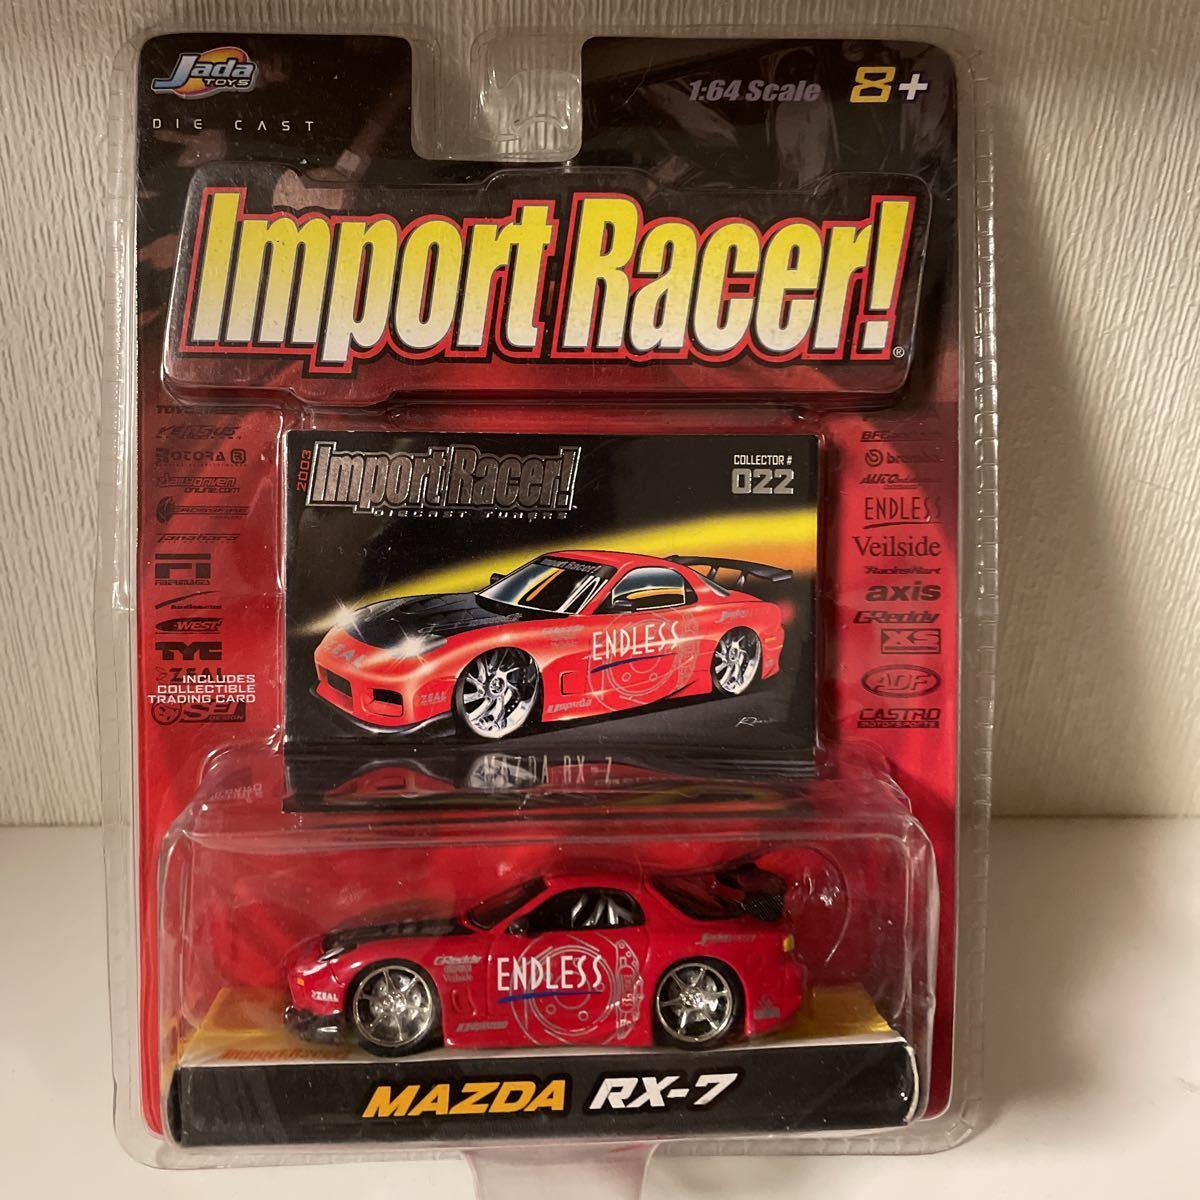 Jada ジェイダ Import Racer Mazda RX-7 Endless マツダ 1/64_画像1